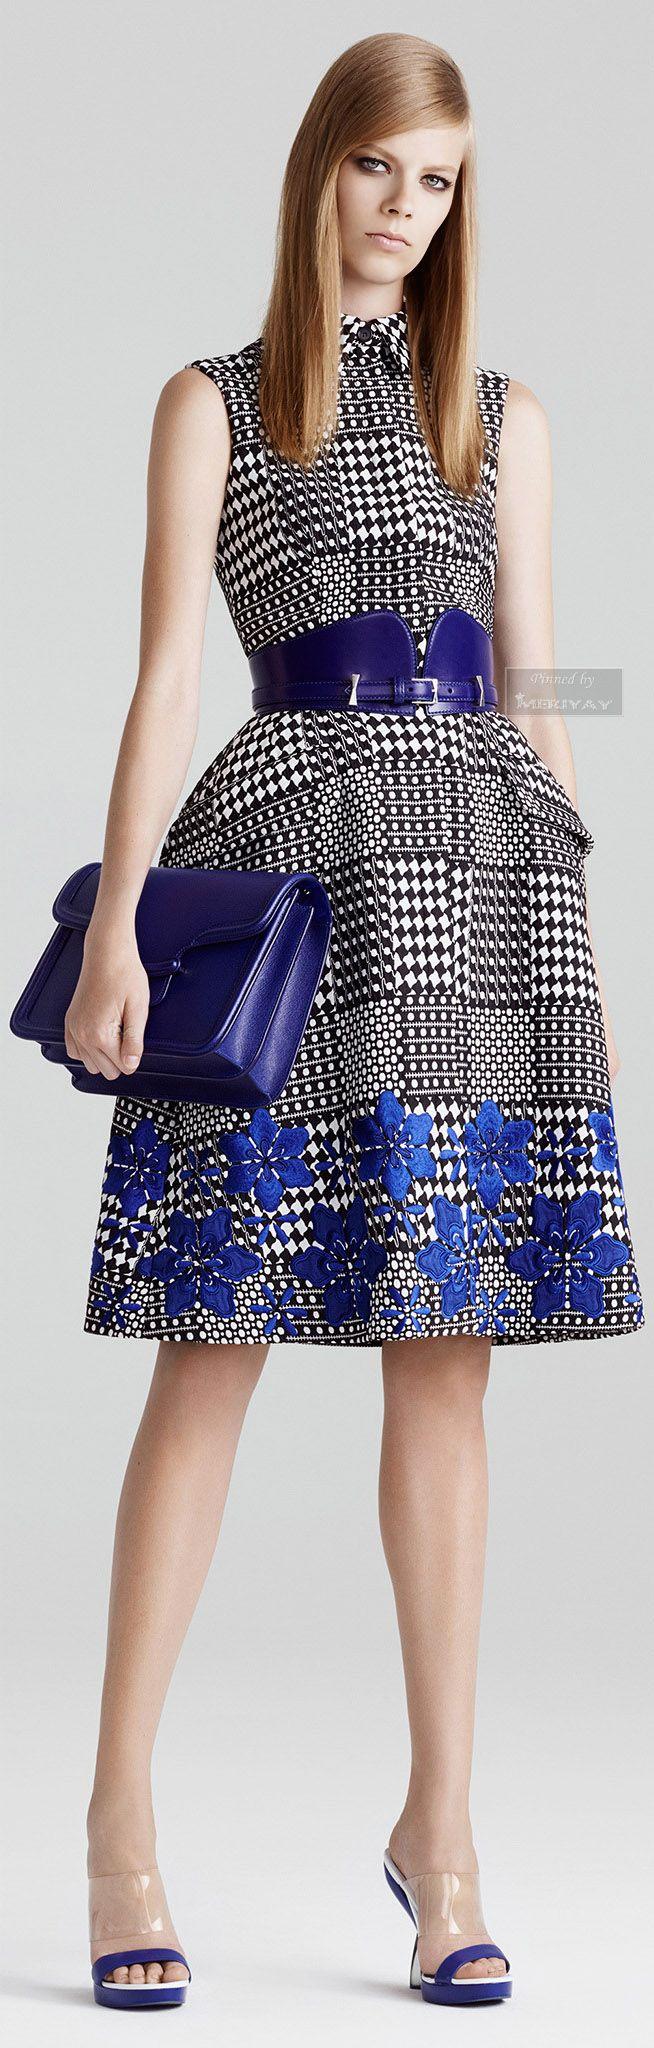 Alexander McQueen Resort 2015. http://es.pinterest.com/meriyay/fashion-dresses-ii/